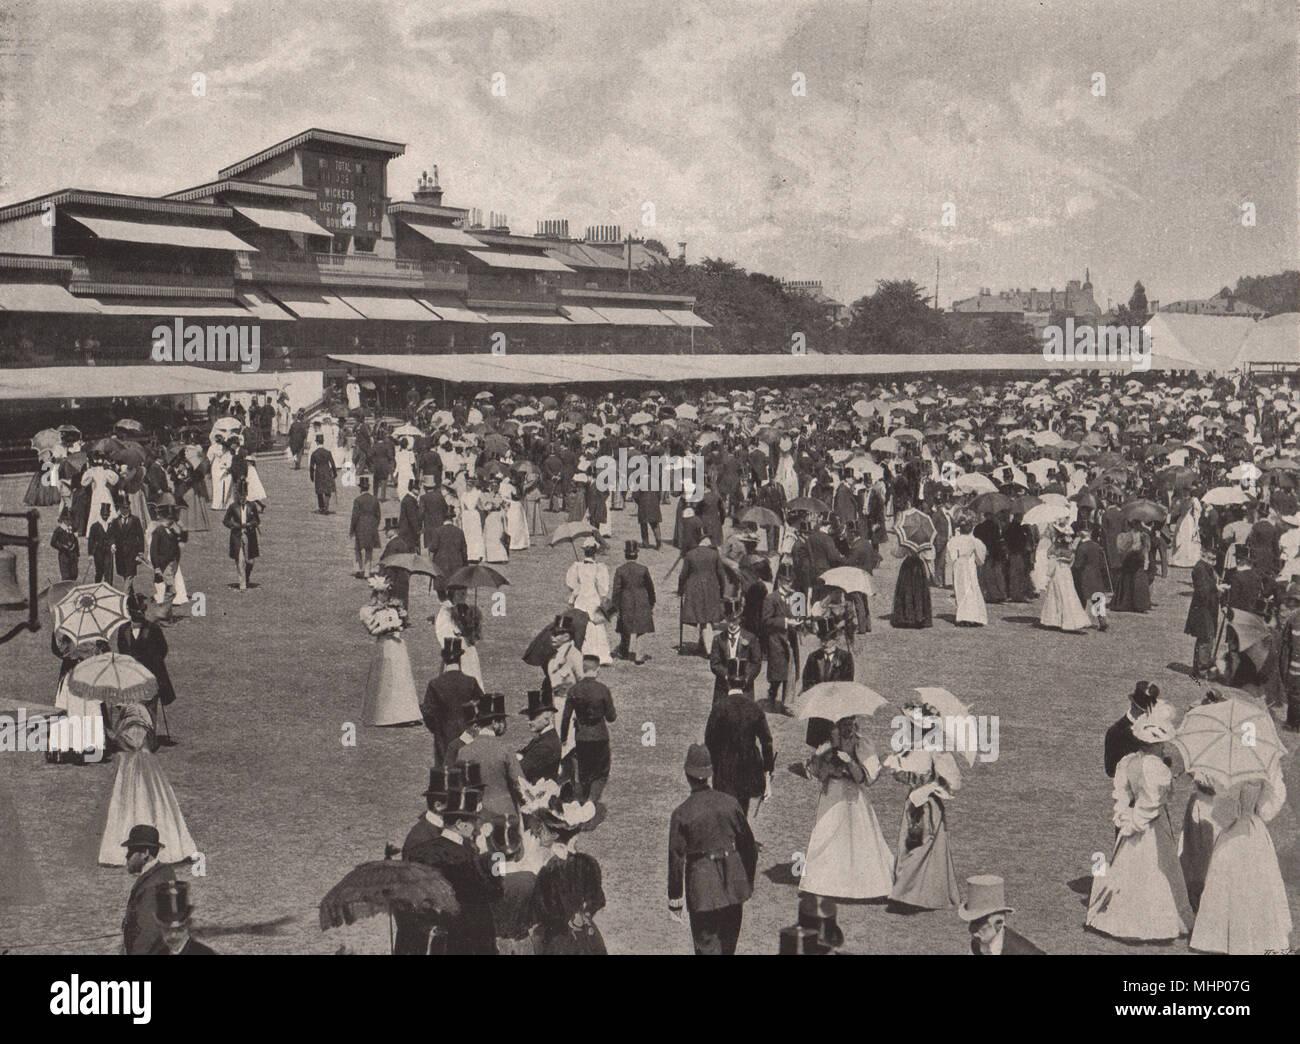 The Eton & Harrow match at Lord's (1895). Luncheon break. London. Cricket 1896 - Stock Image